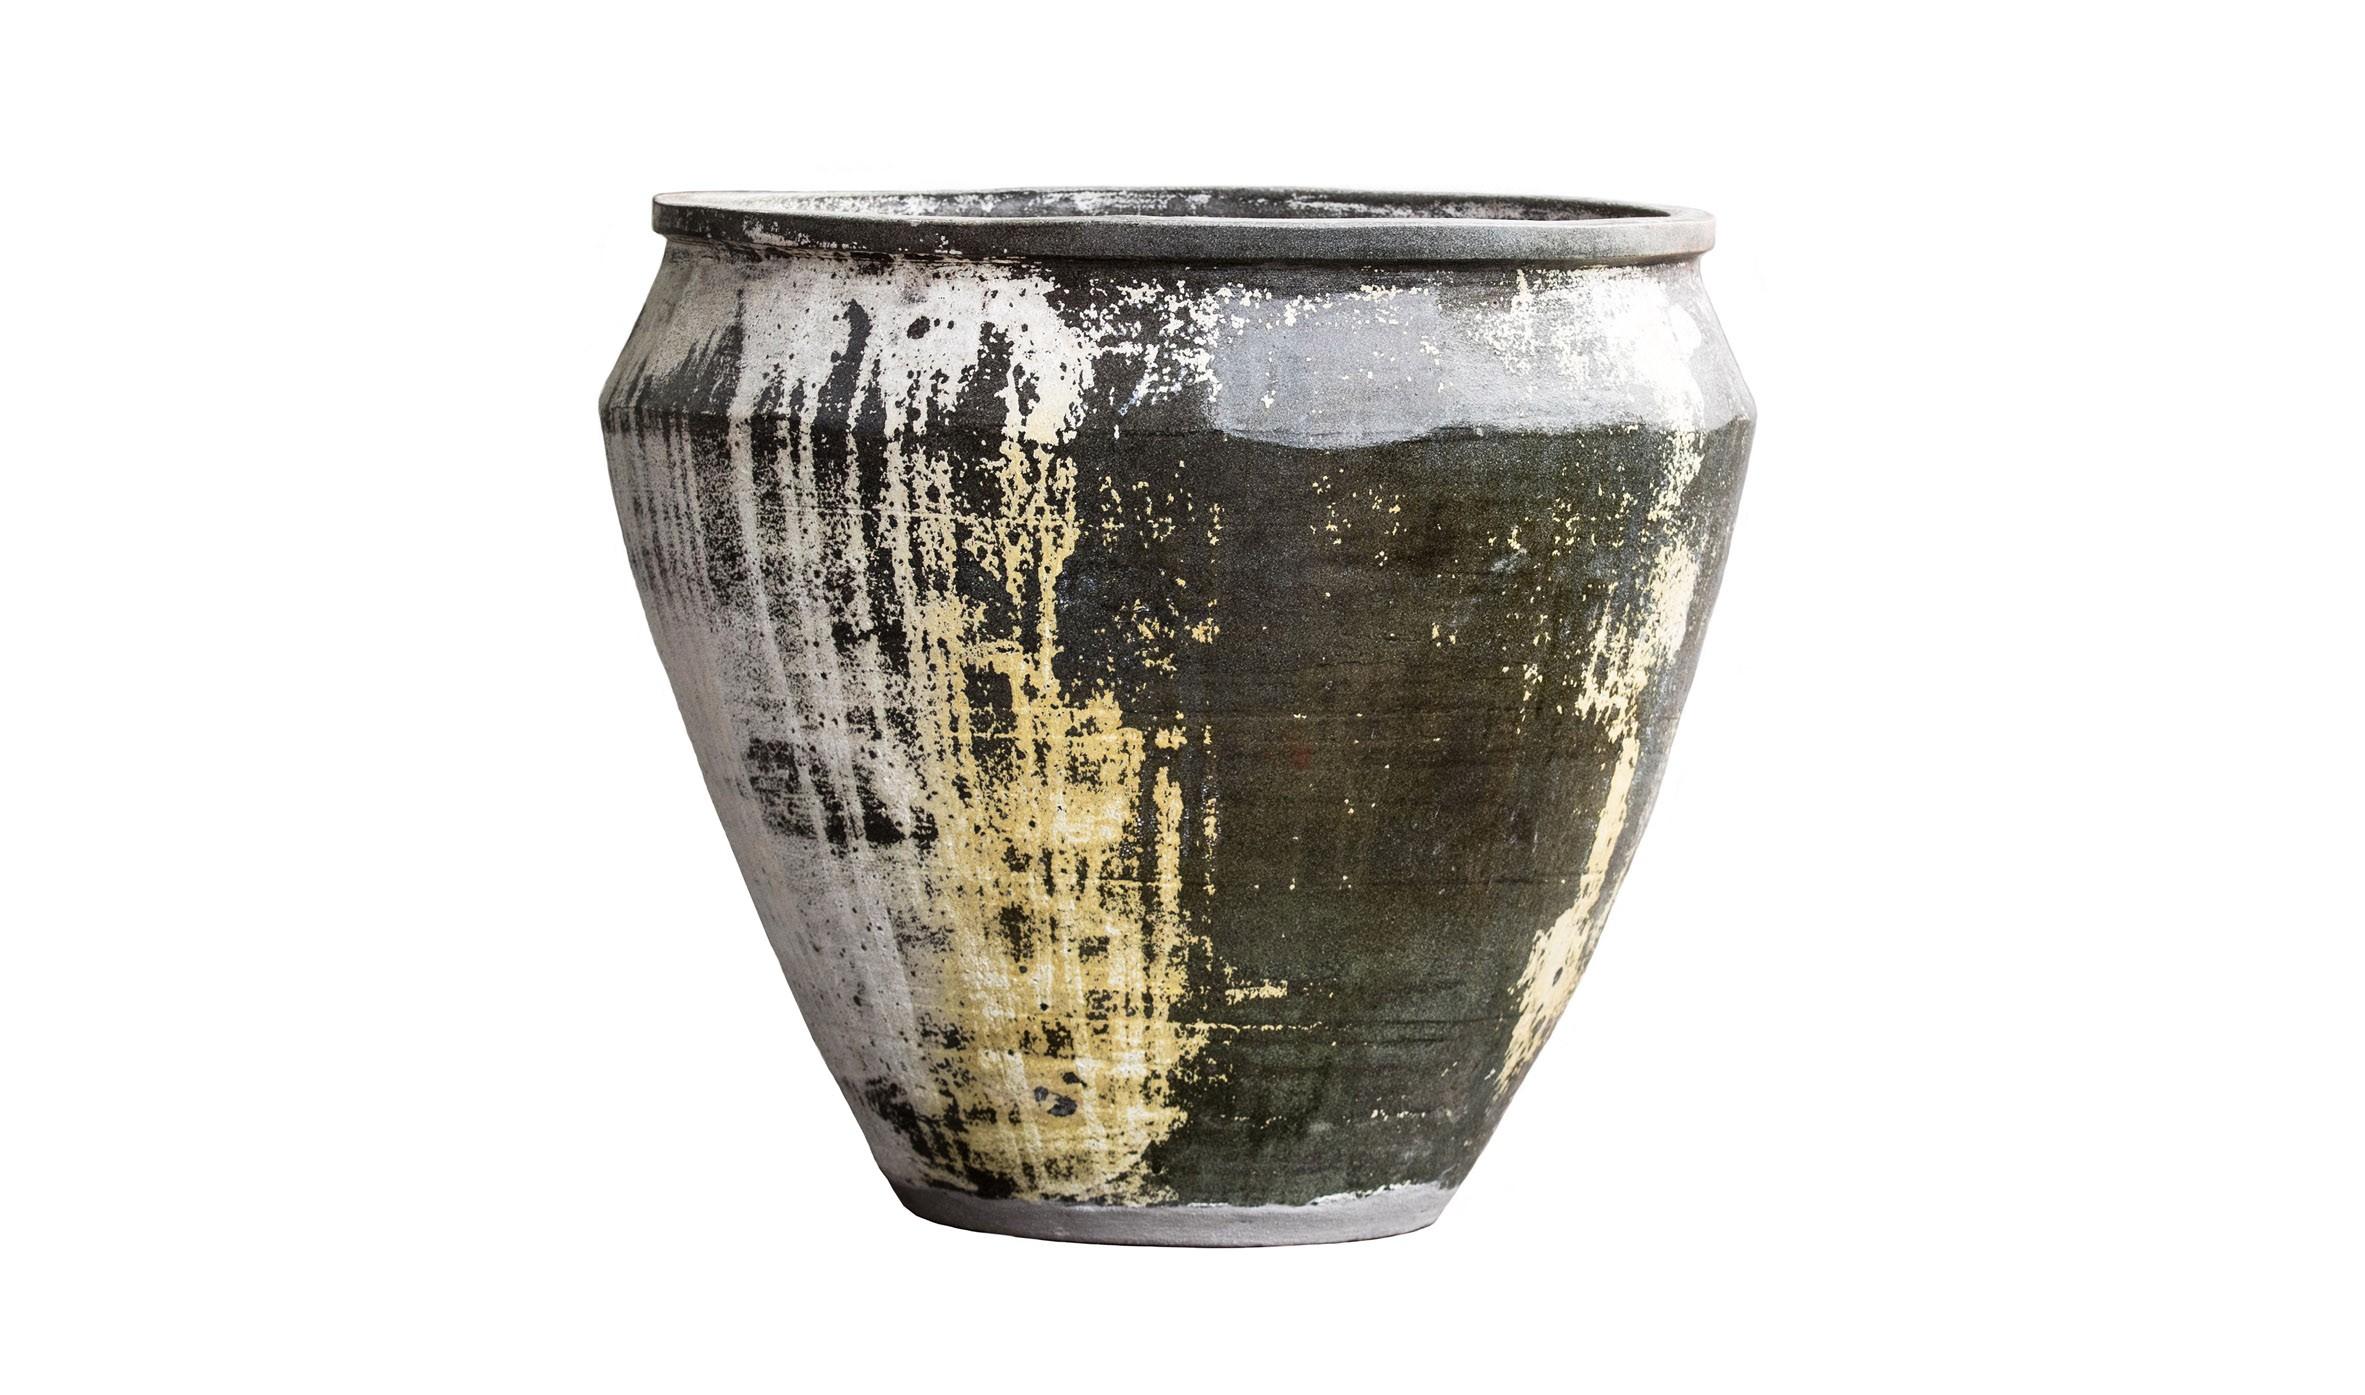 Decor Landare Thumbnails Correa-Clay-Pot-Thumbnail-01